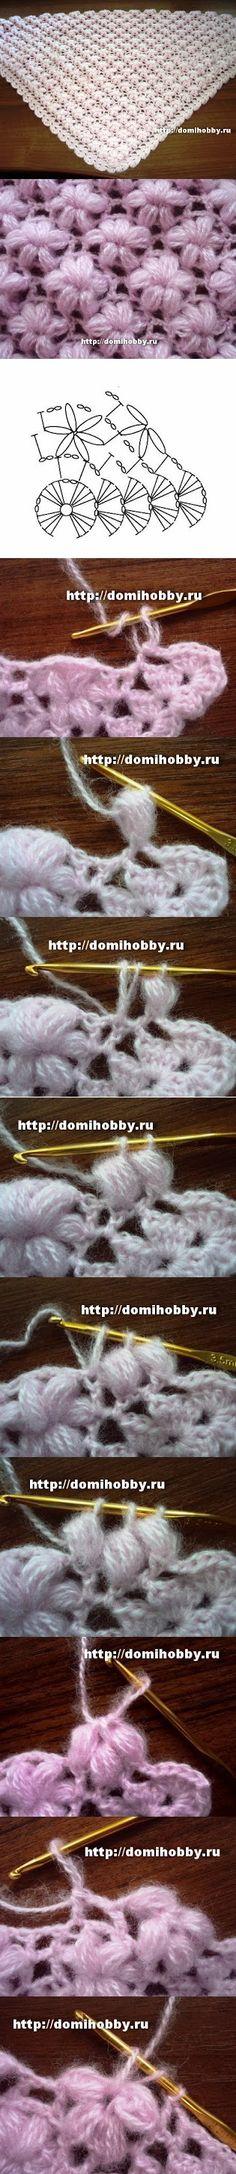 Chal flores puff. http://neddle-crafts.blogspot.com.ar/2011/08/crochet-shawel.html?m=0